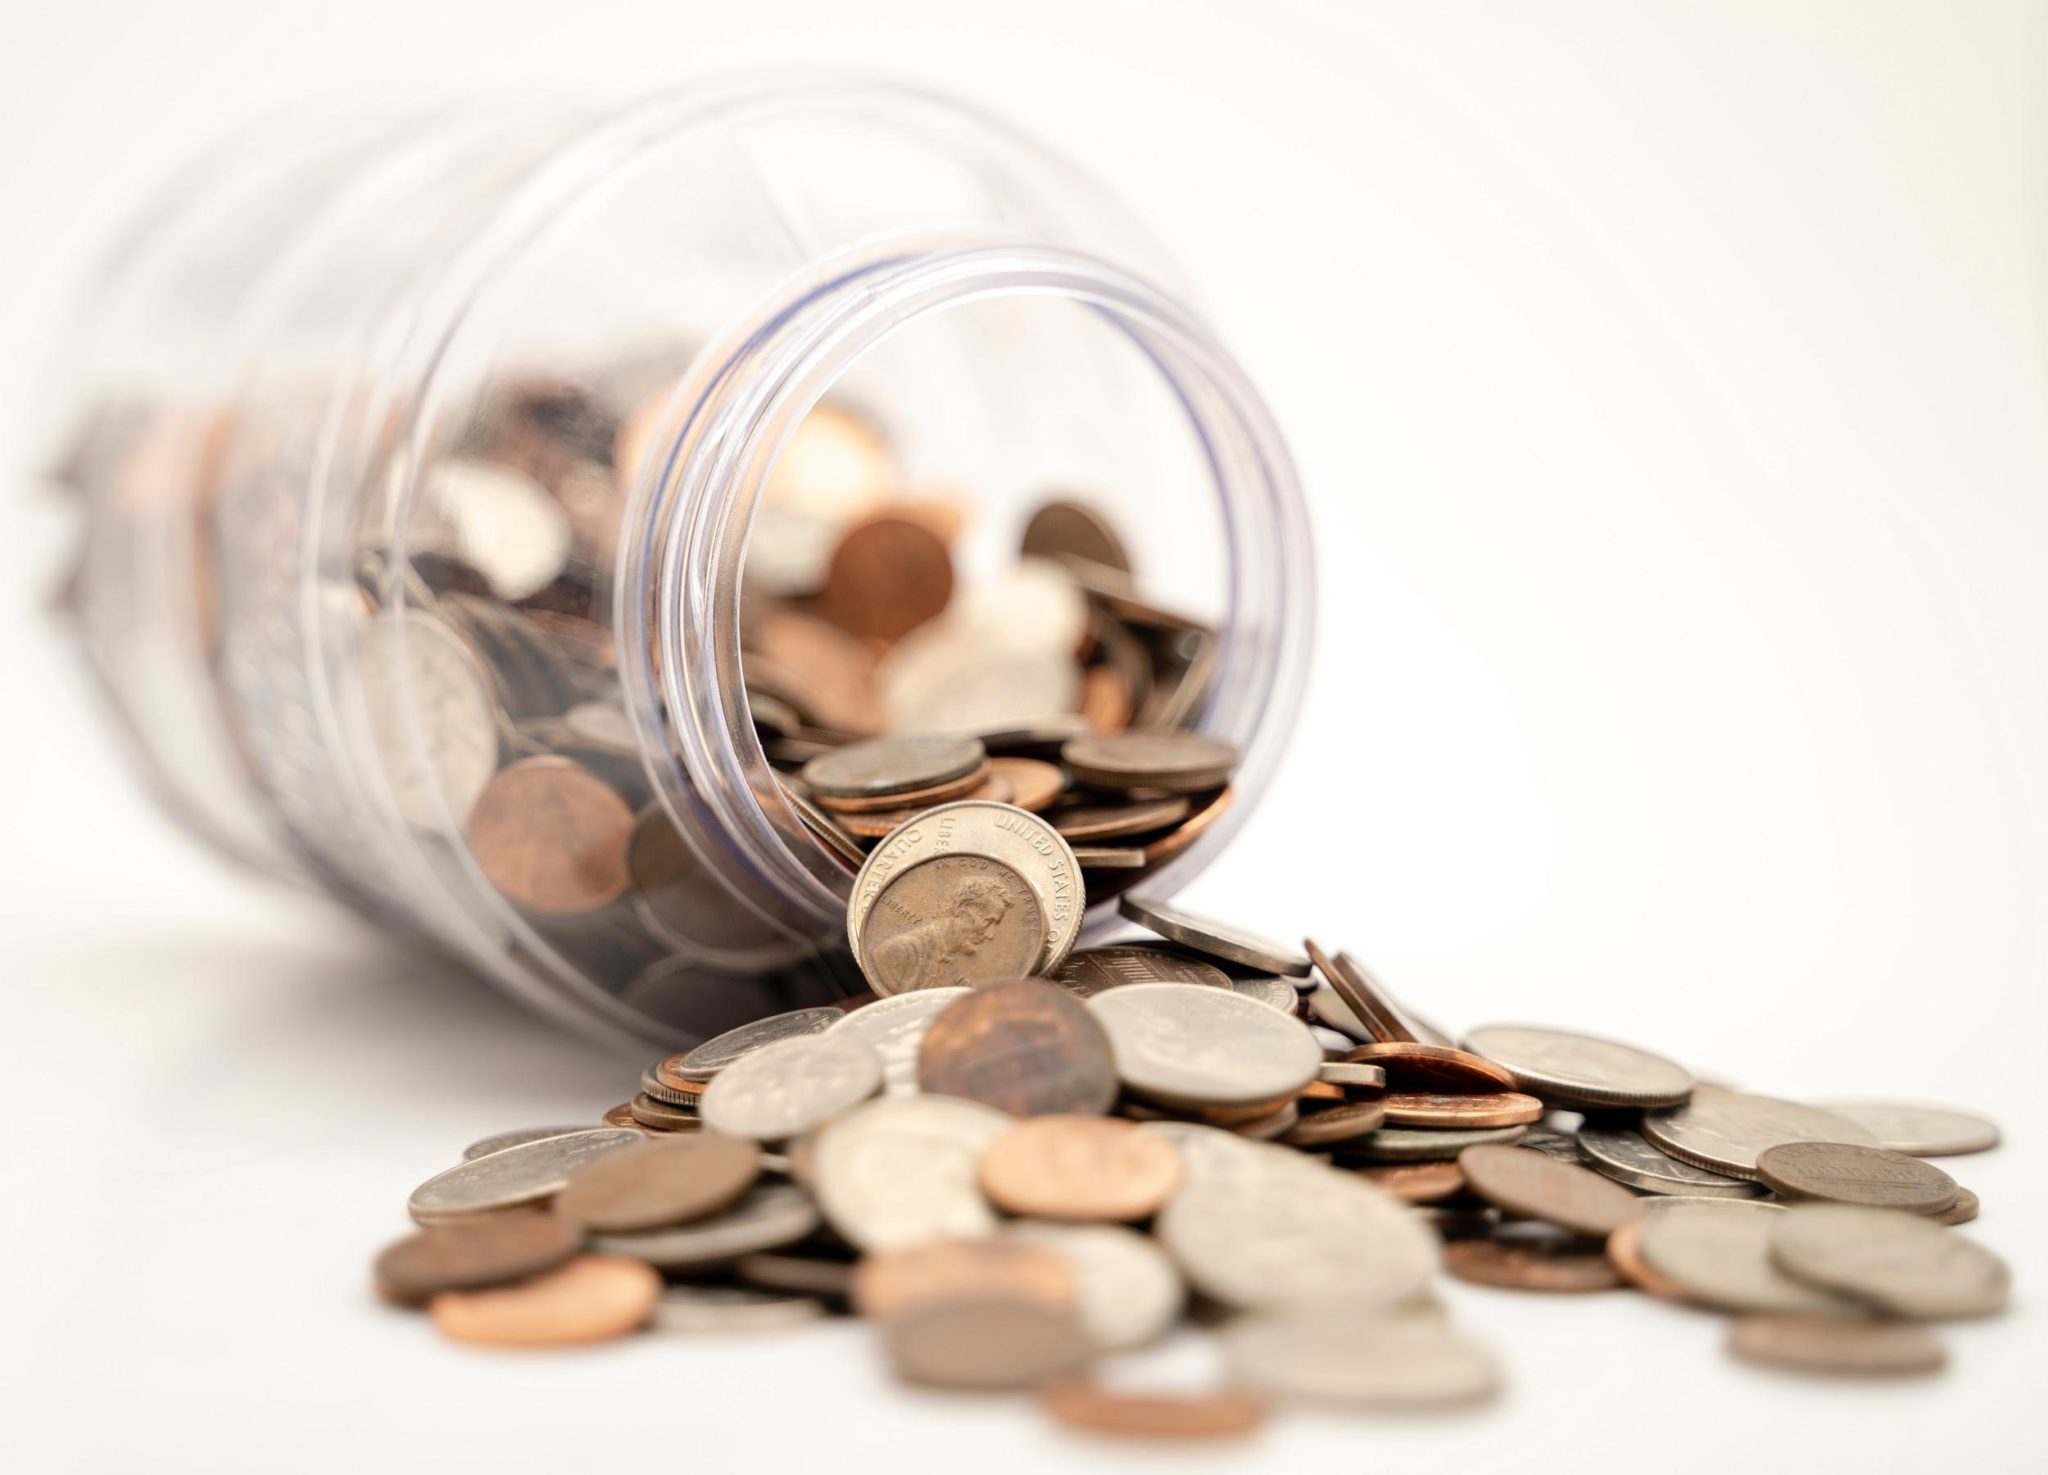 Online Instalment Loans